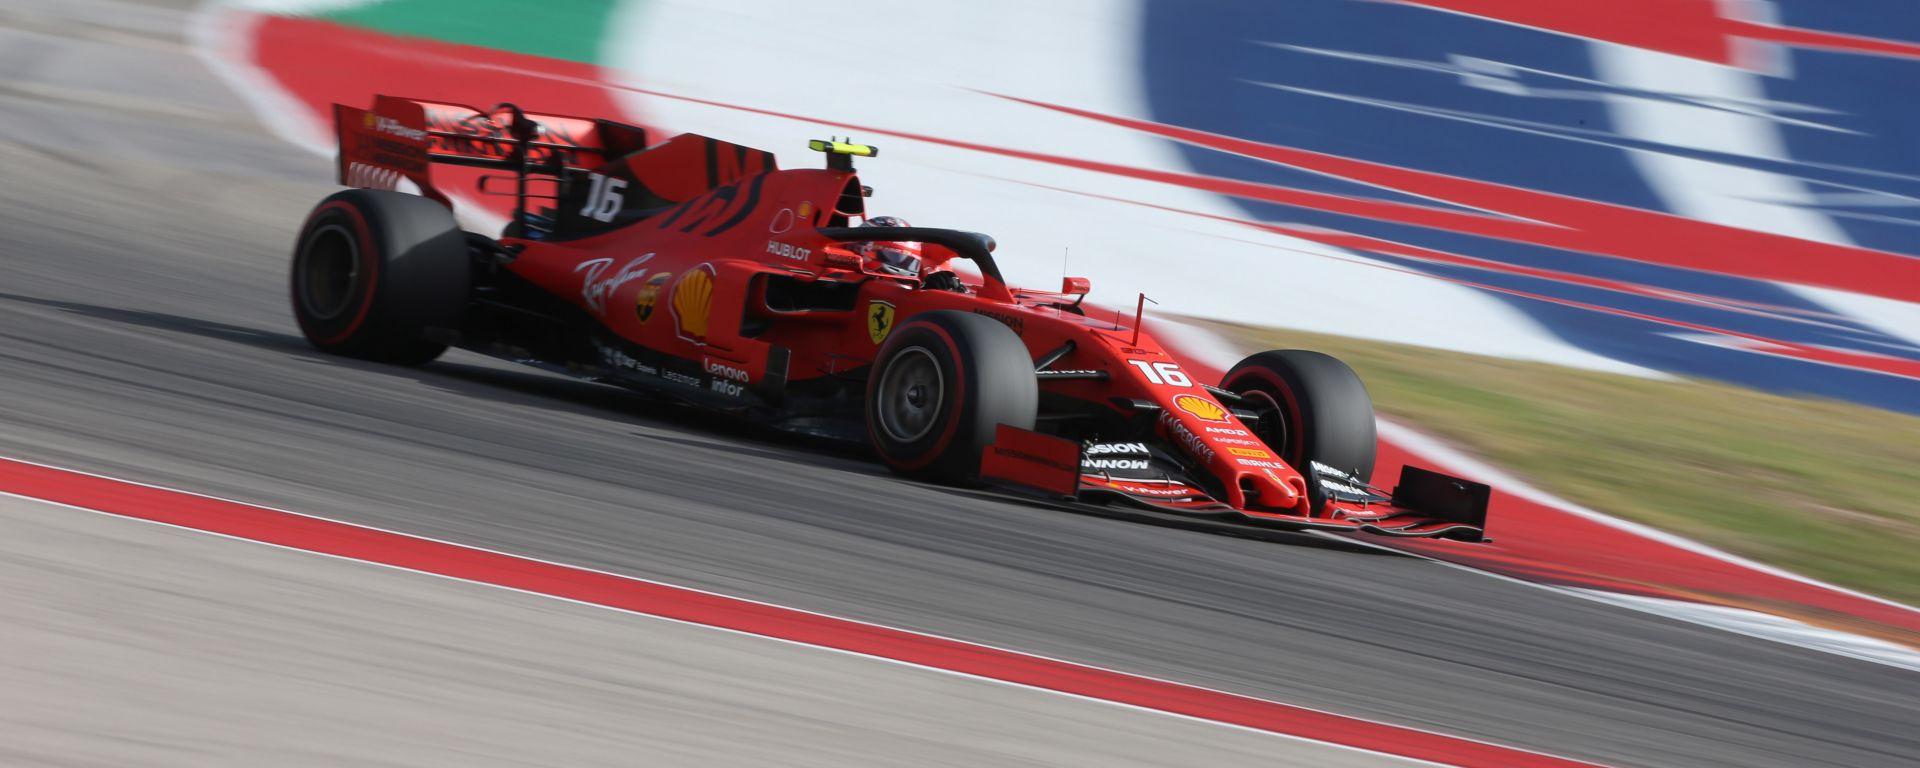 F1, GP Stati Uniti 2019: Charles Leclerc (Ferrari)